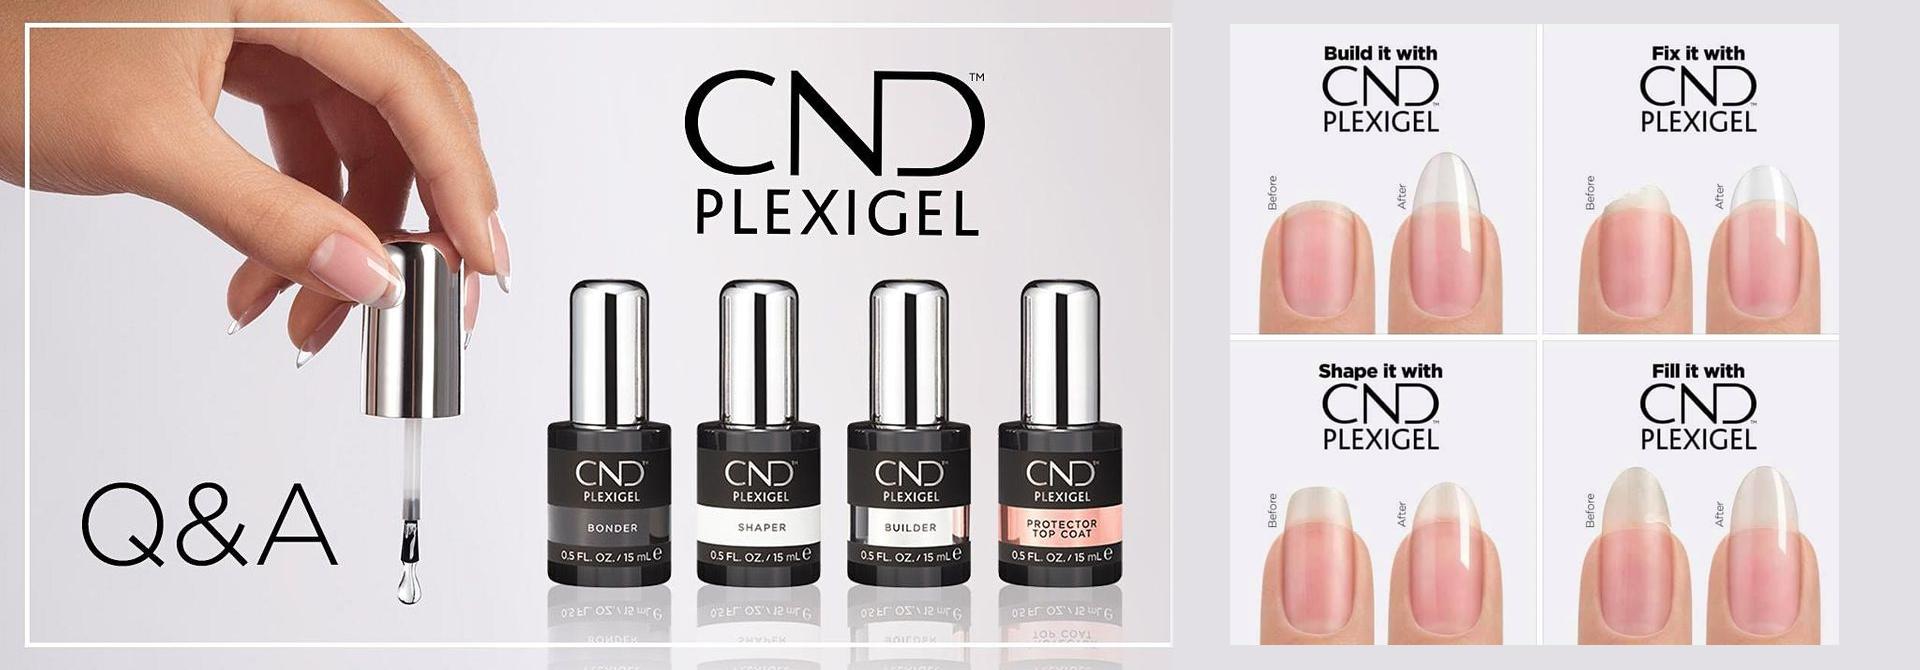 cnd-plexigel.jpg